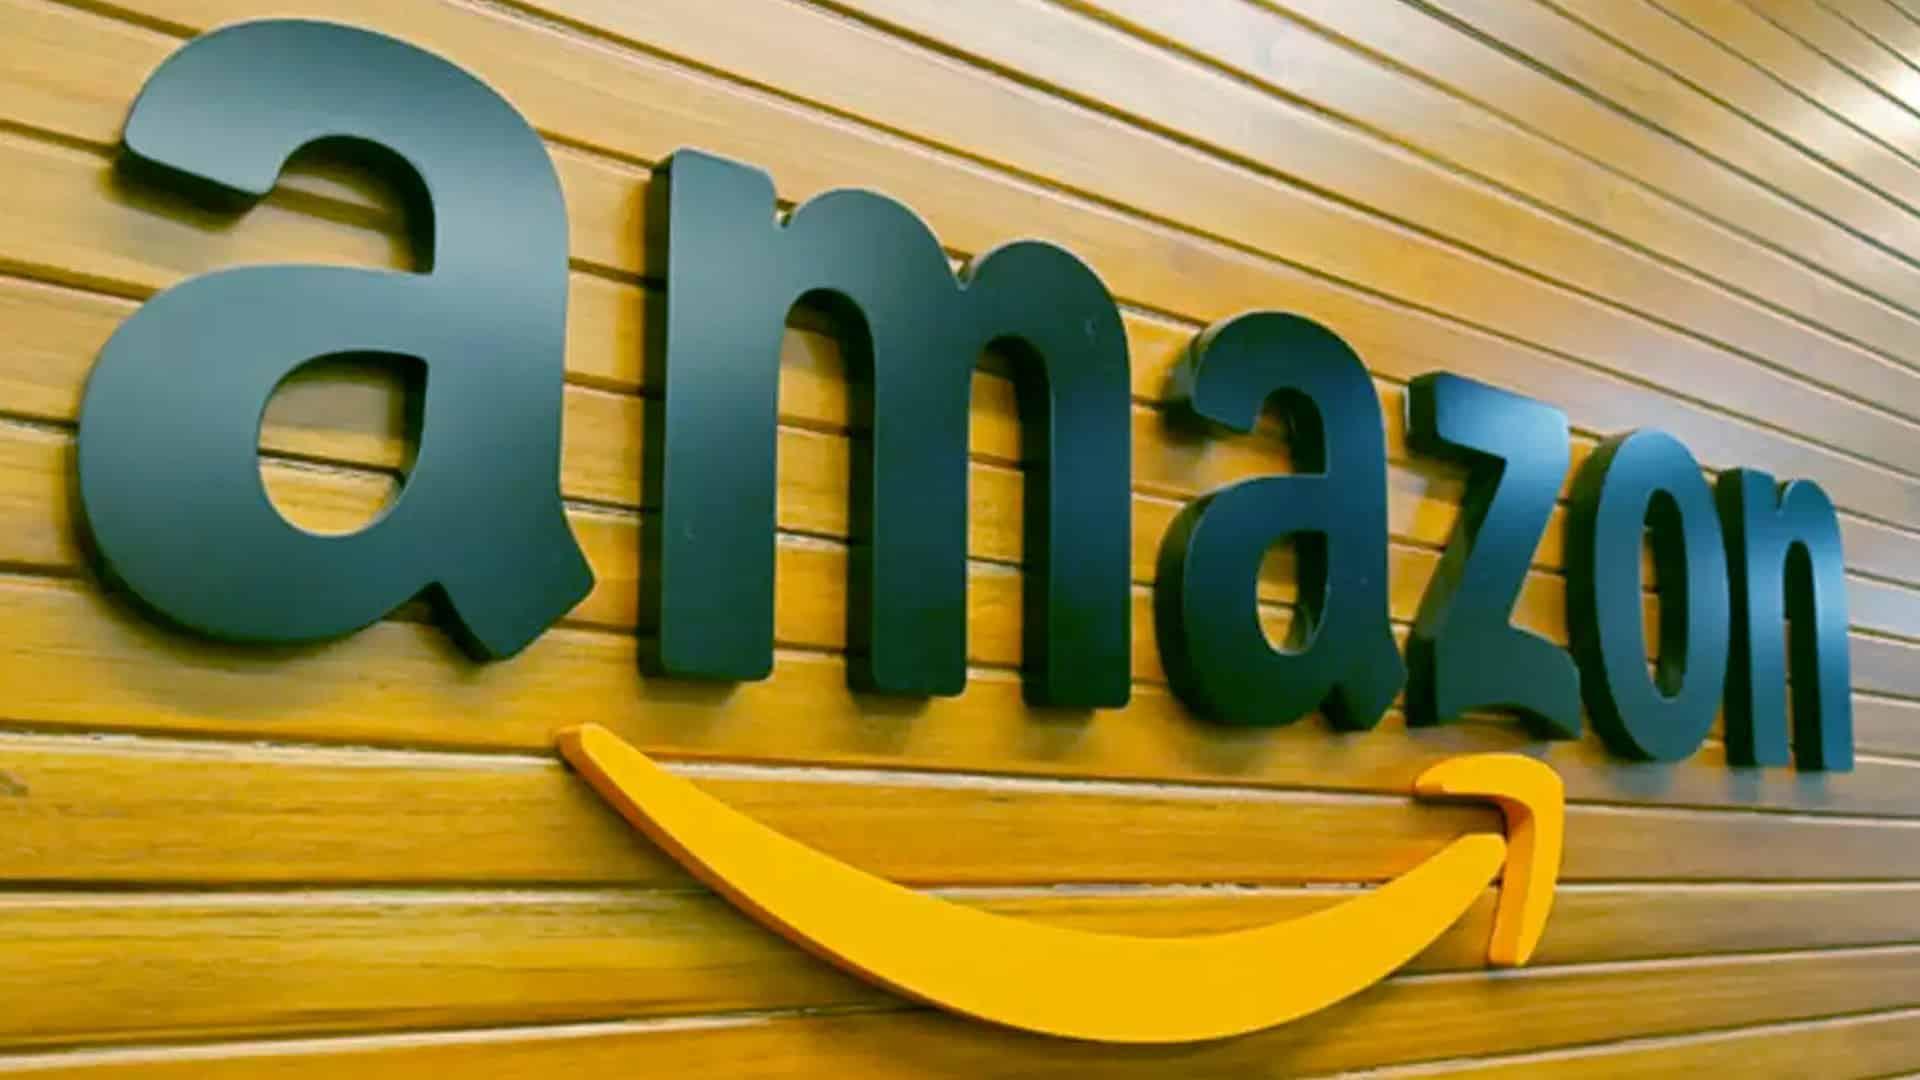 Samsung, Xiaomi, OnePlus most preferred smartphone brands this festive season: Amazon India